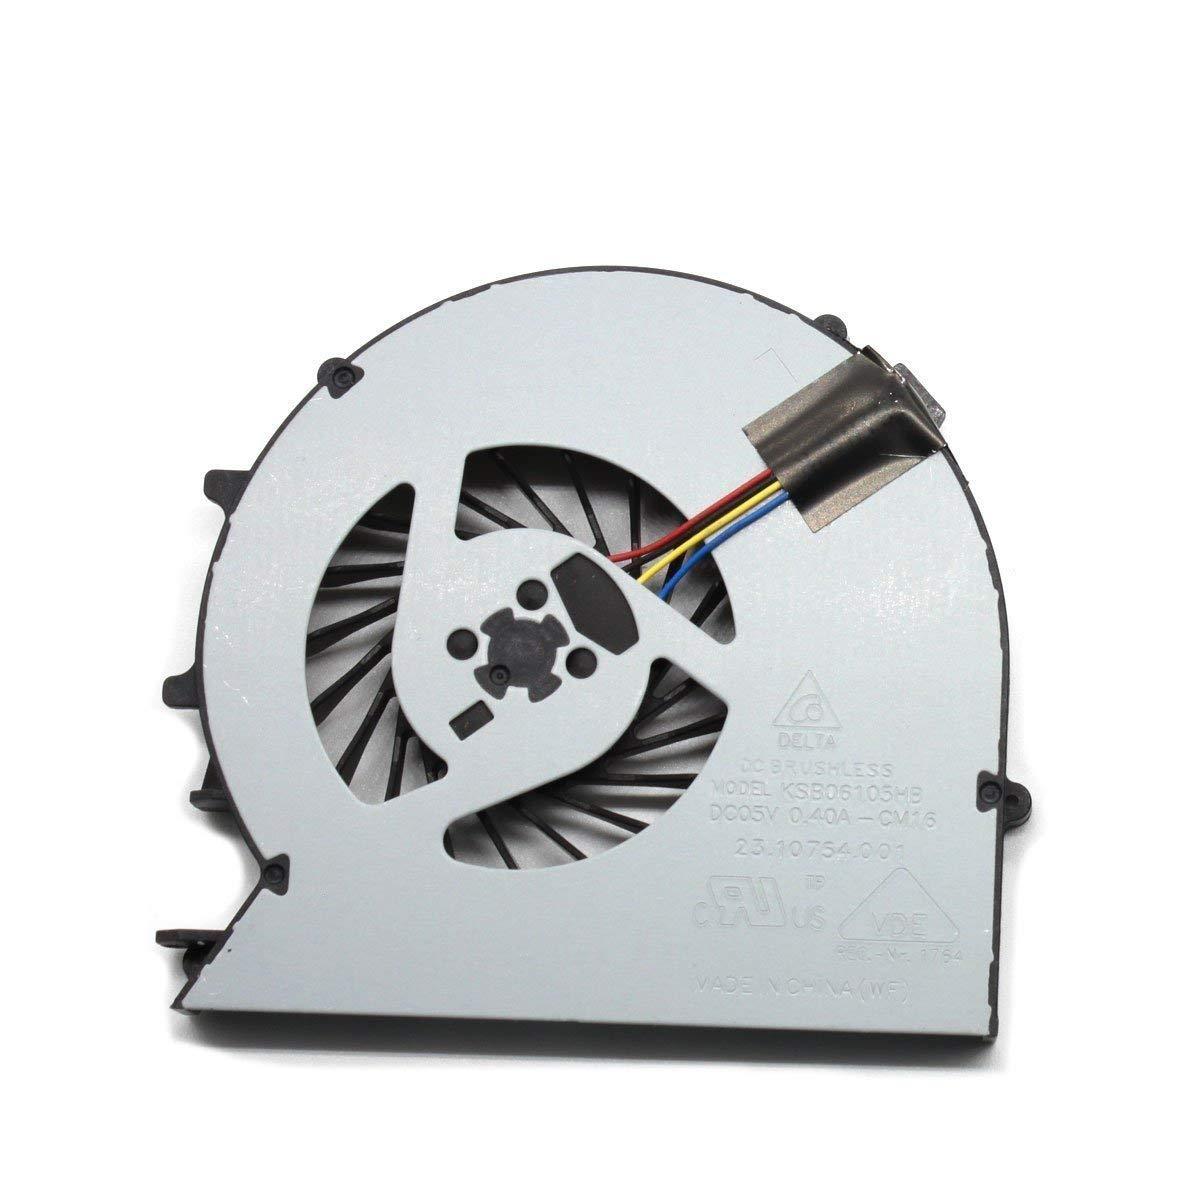 iiFix New CPU Cooling Cooler Fan For HP Probook 450 G1 455 G1 470 G1, P/N: 721937-001 721938-001